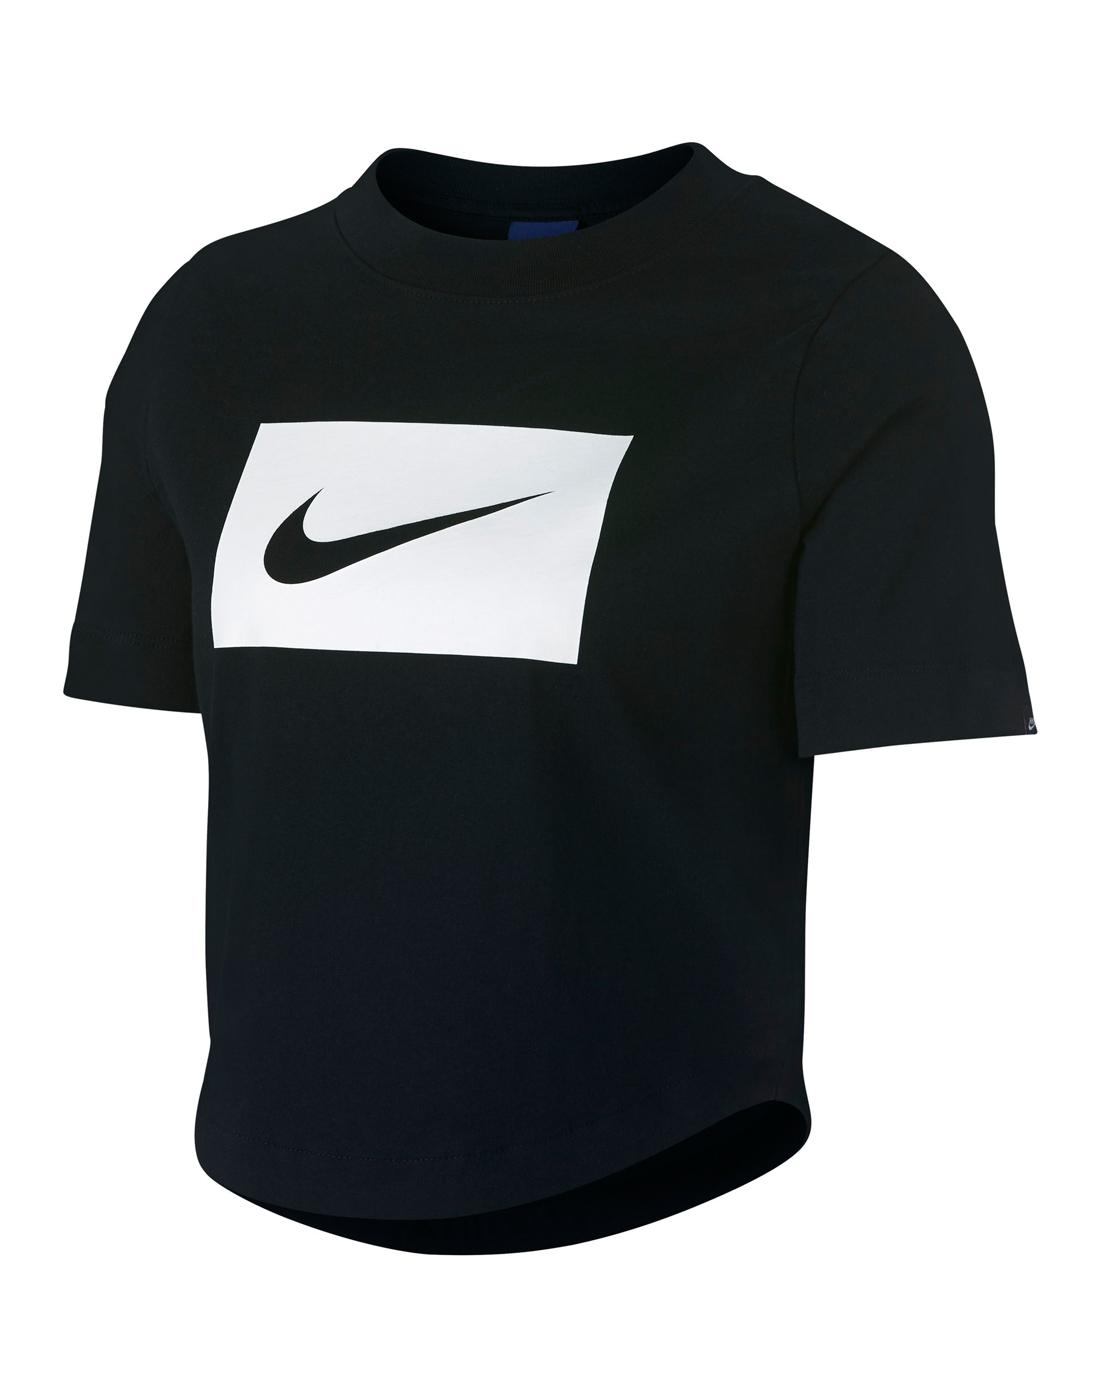 c6b36776a Nike Womens Swoosh Crop T-Shirt | Life Style Sports